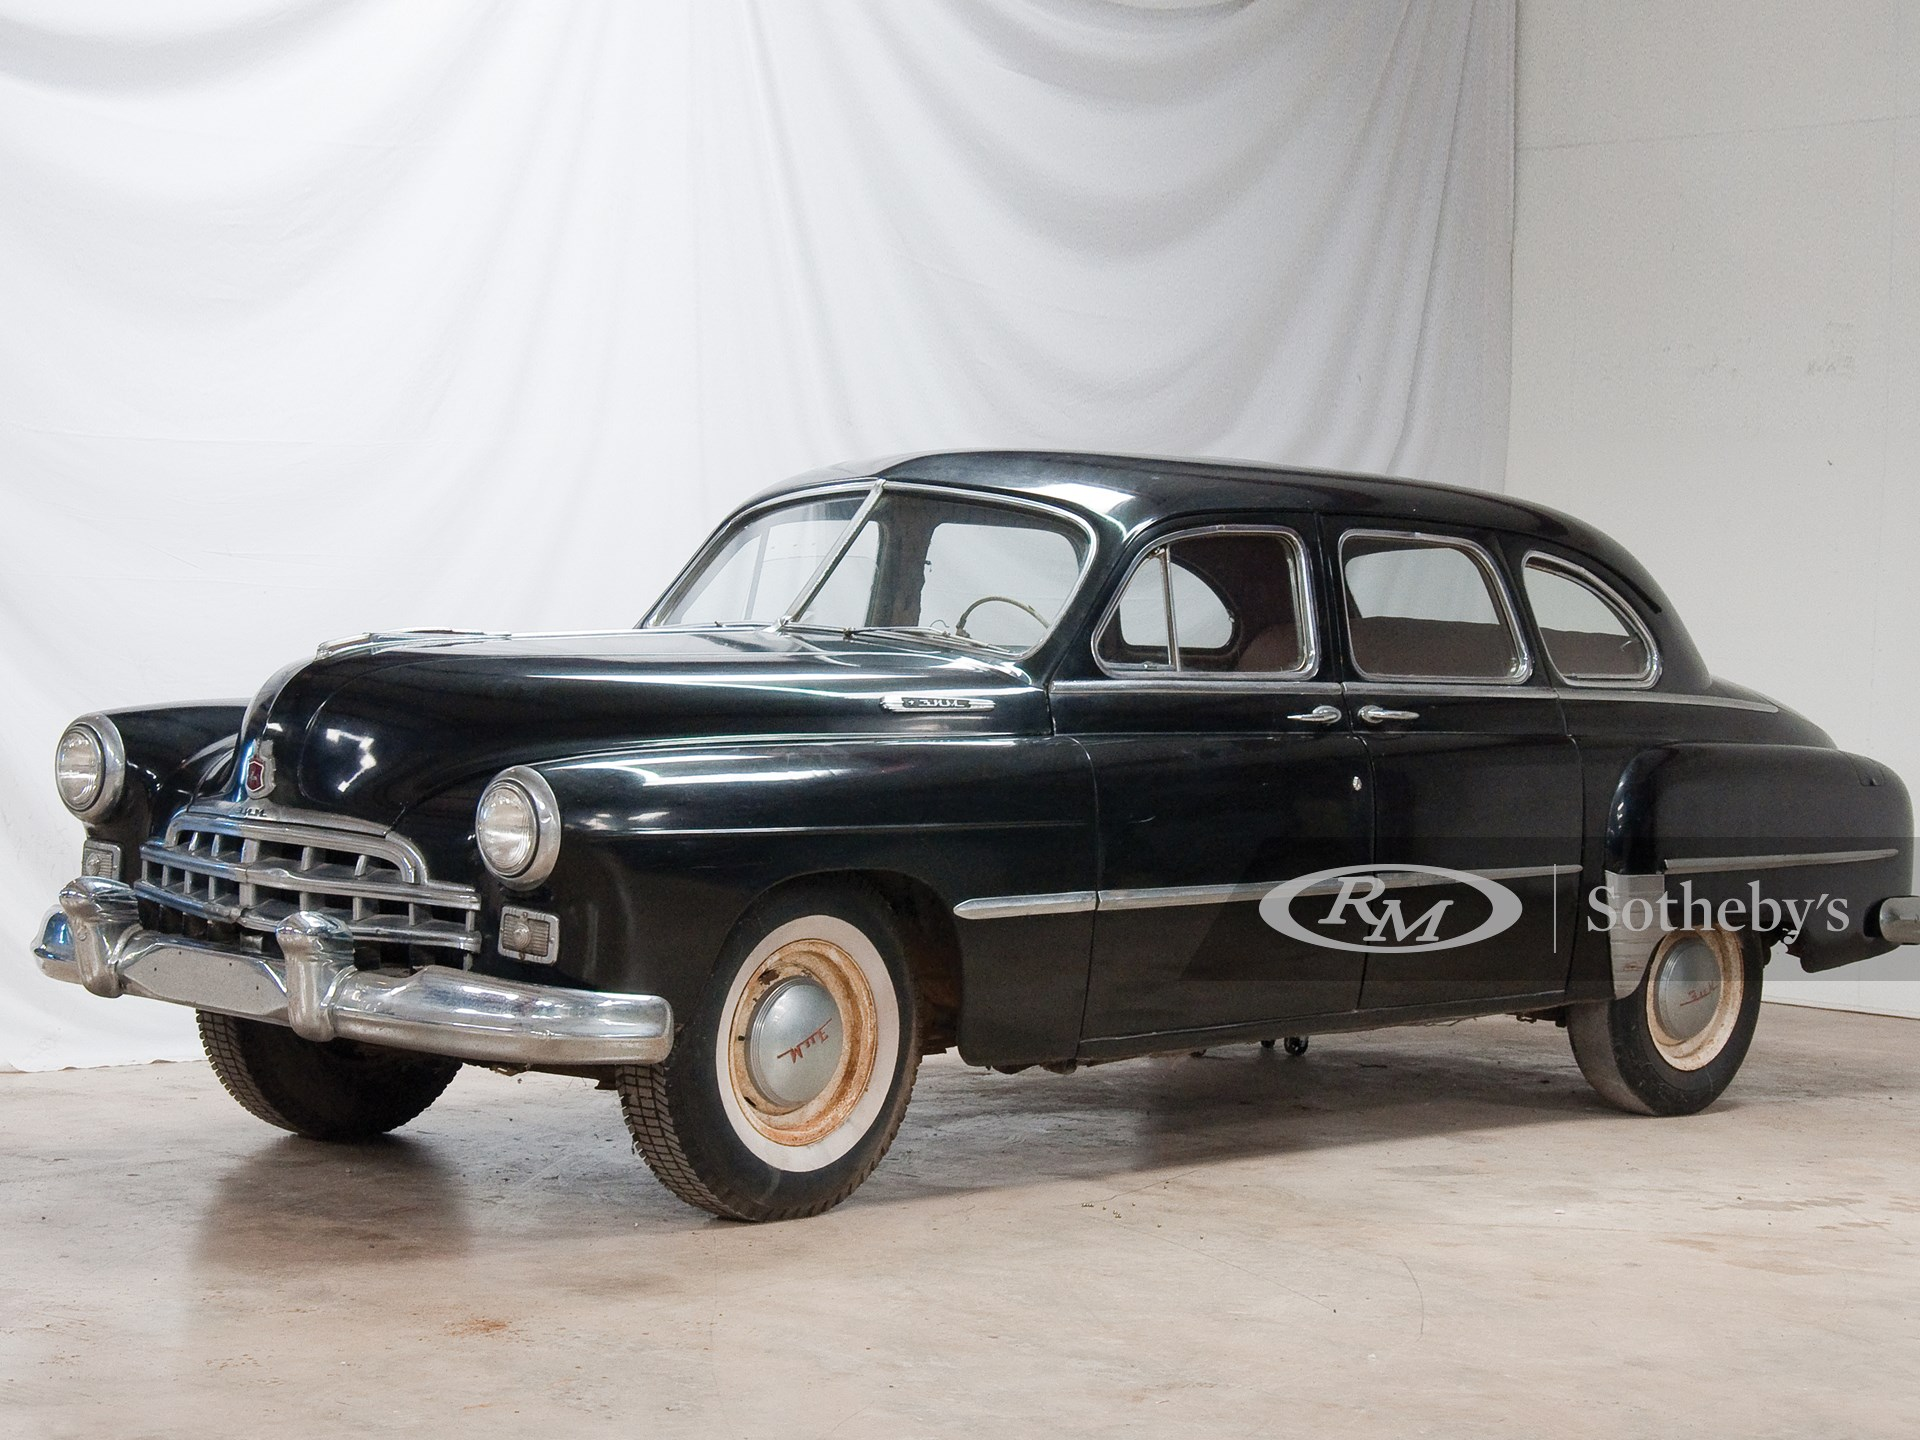 1950 Zim Soviet Limousine